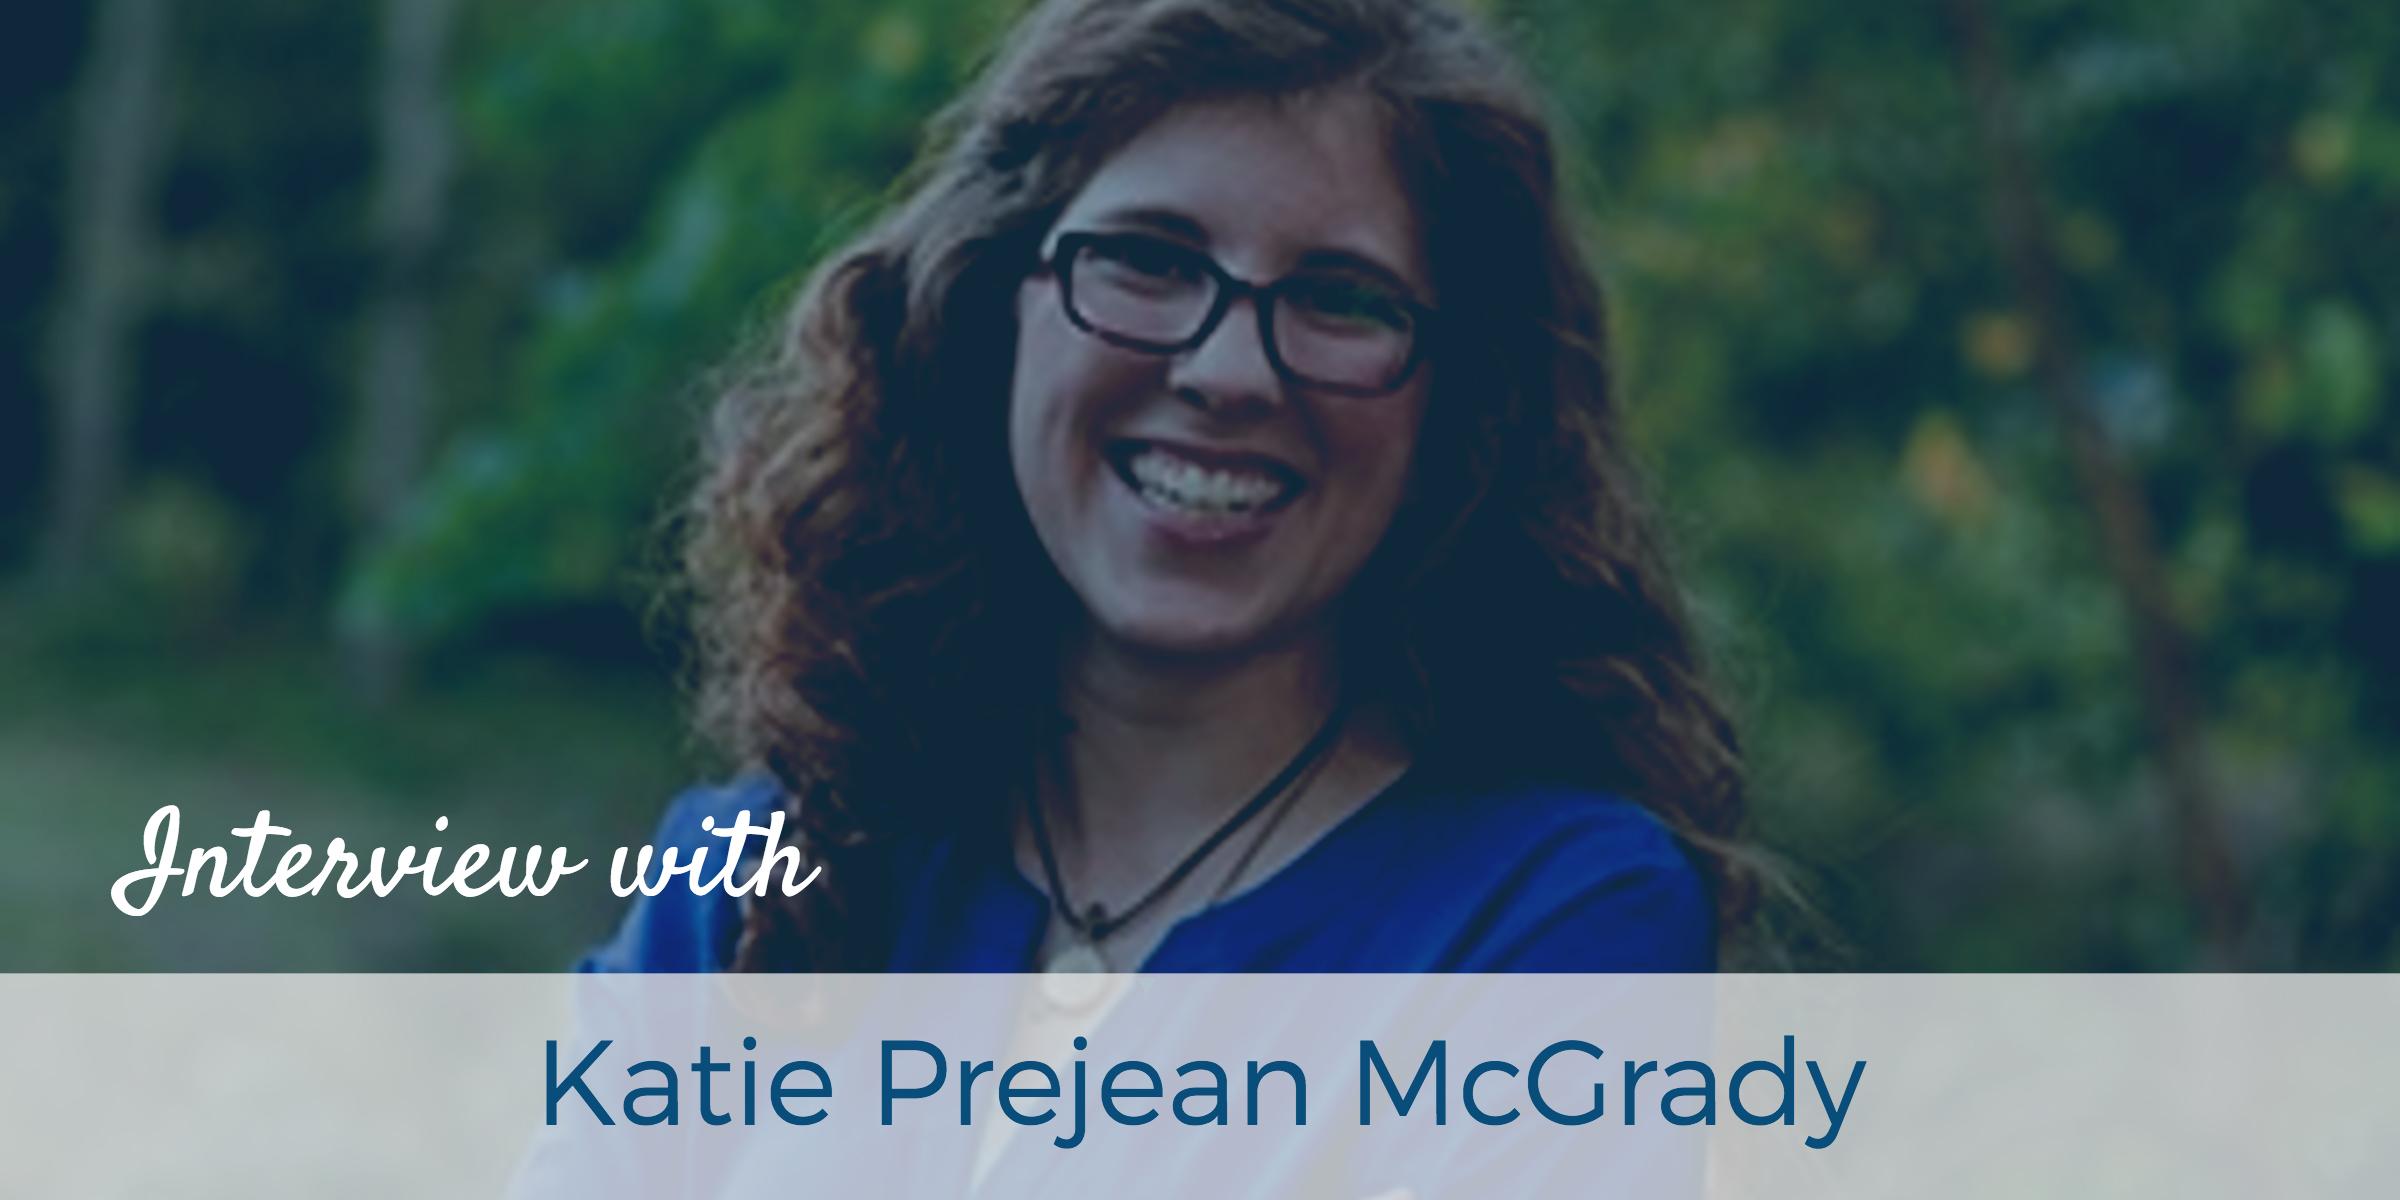 Katie Prejean McGrady on The New Evangelization